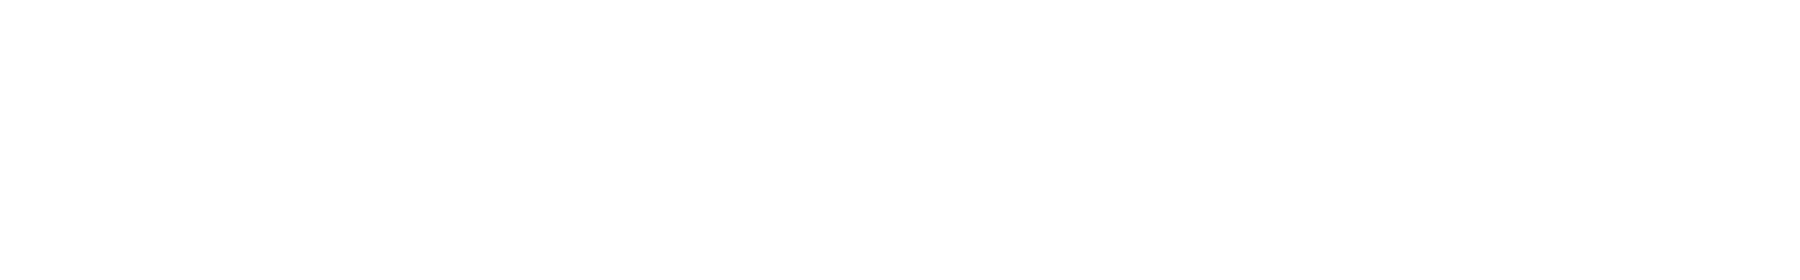 sad bell melody